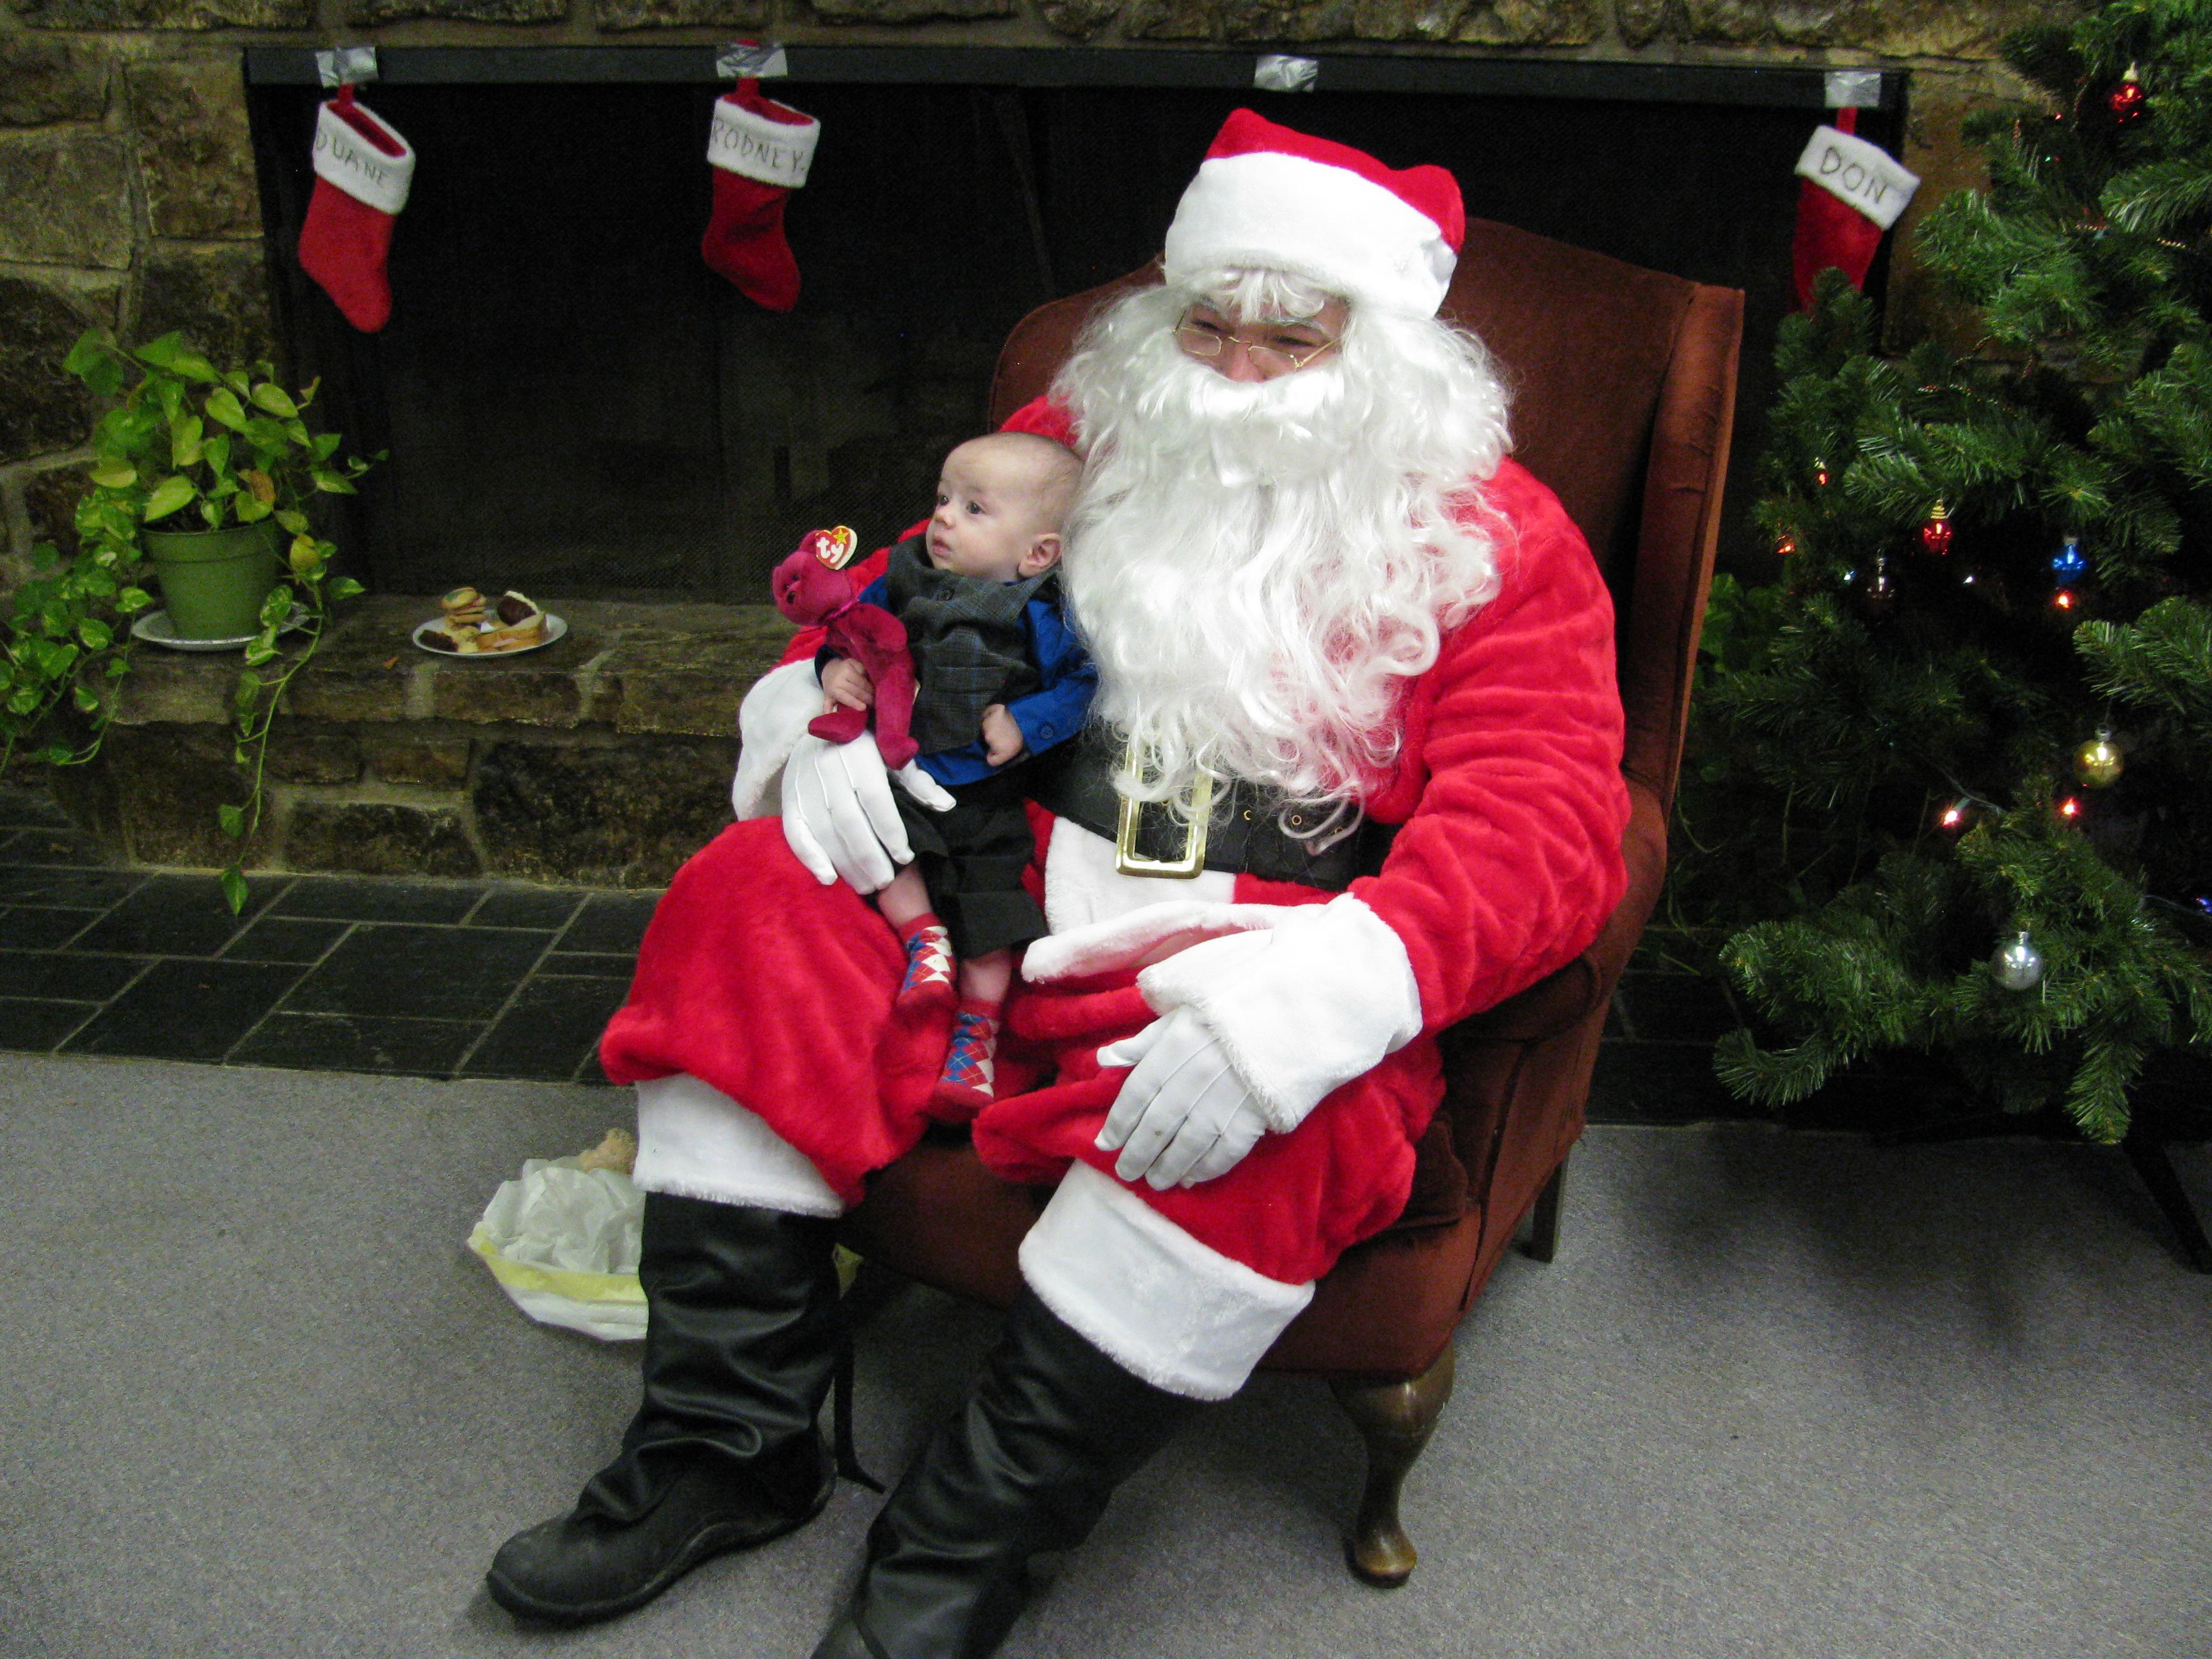 Baby's 1st Christmas!